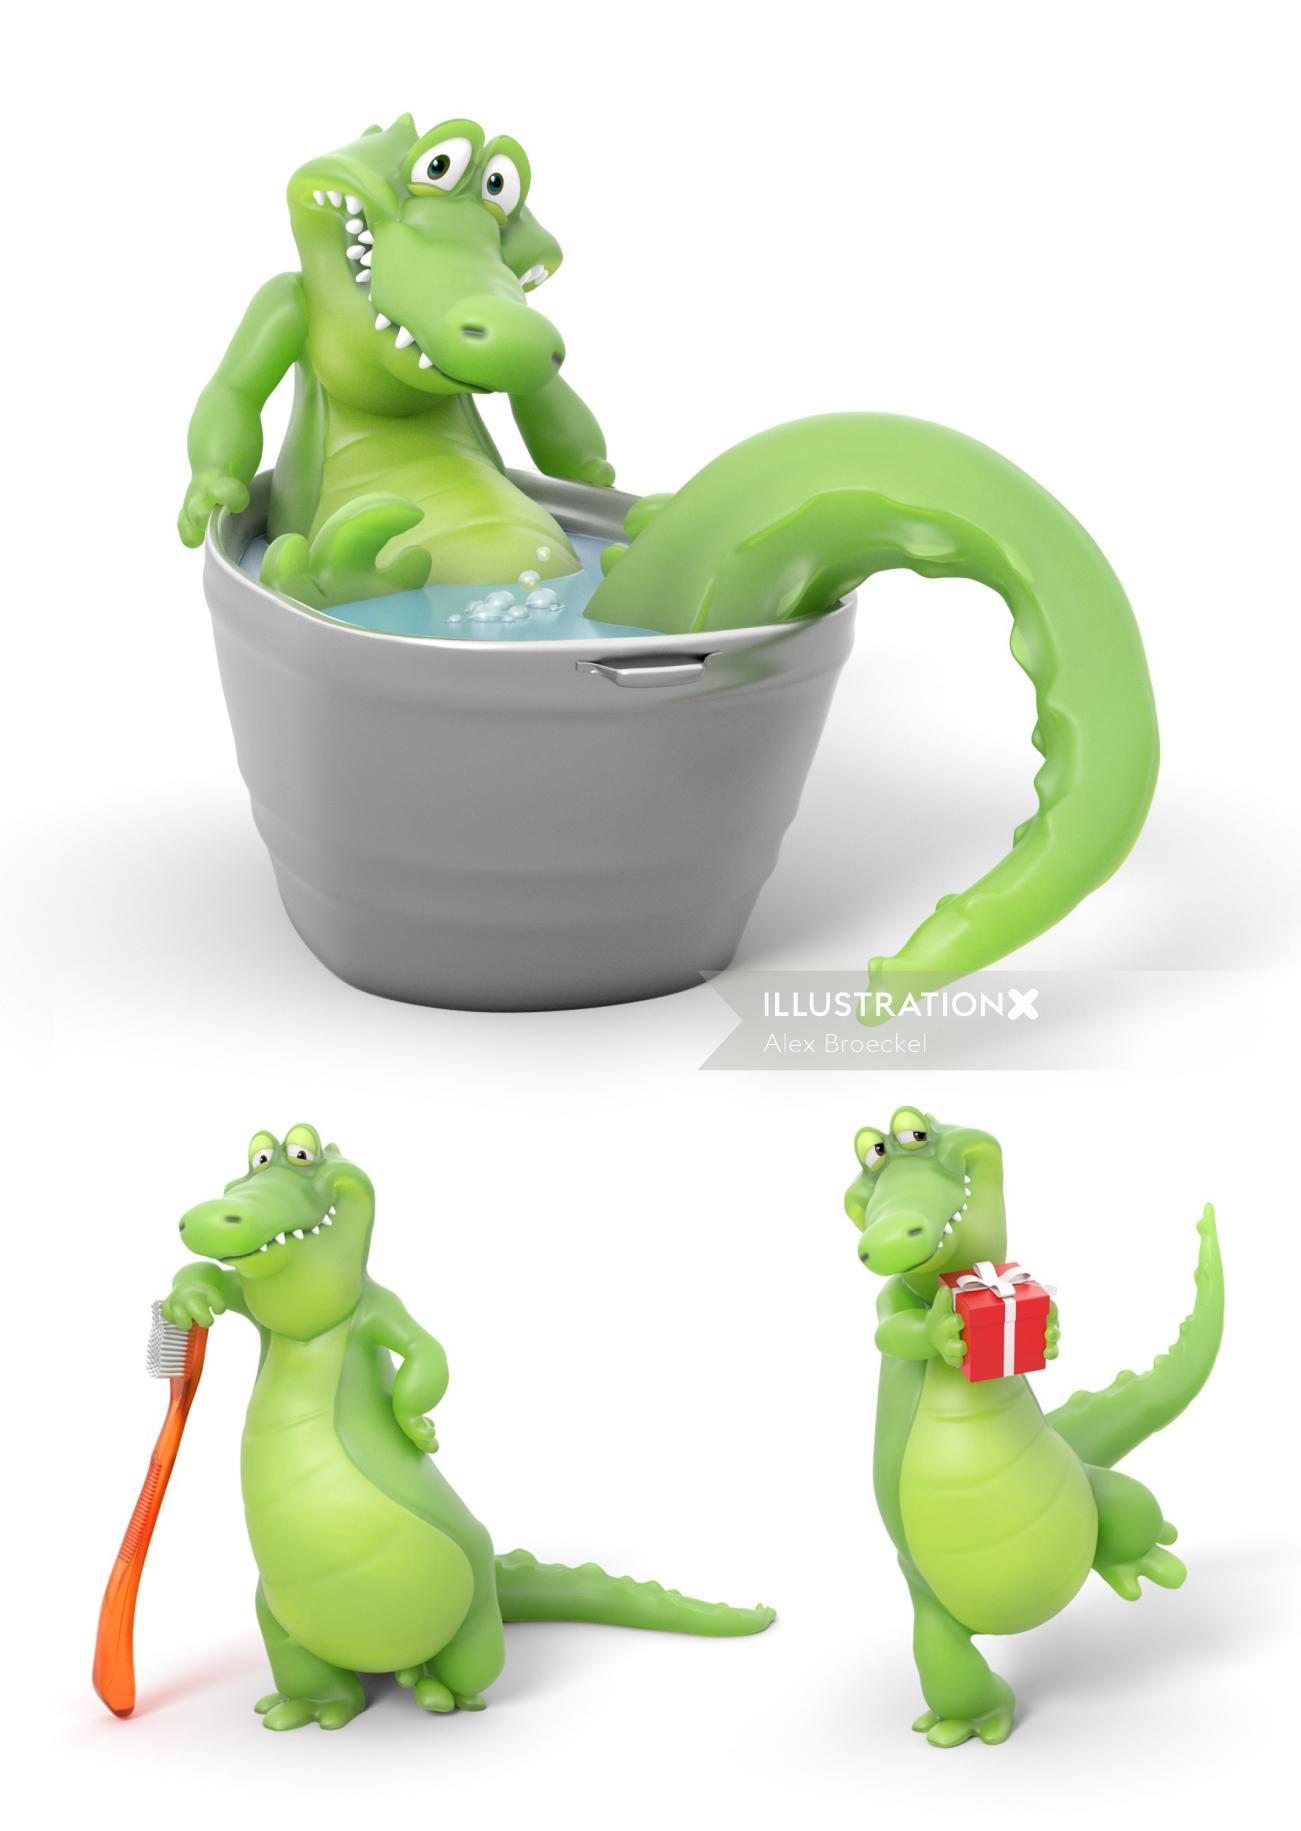 3D rendering of fun crocodile